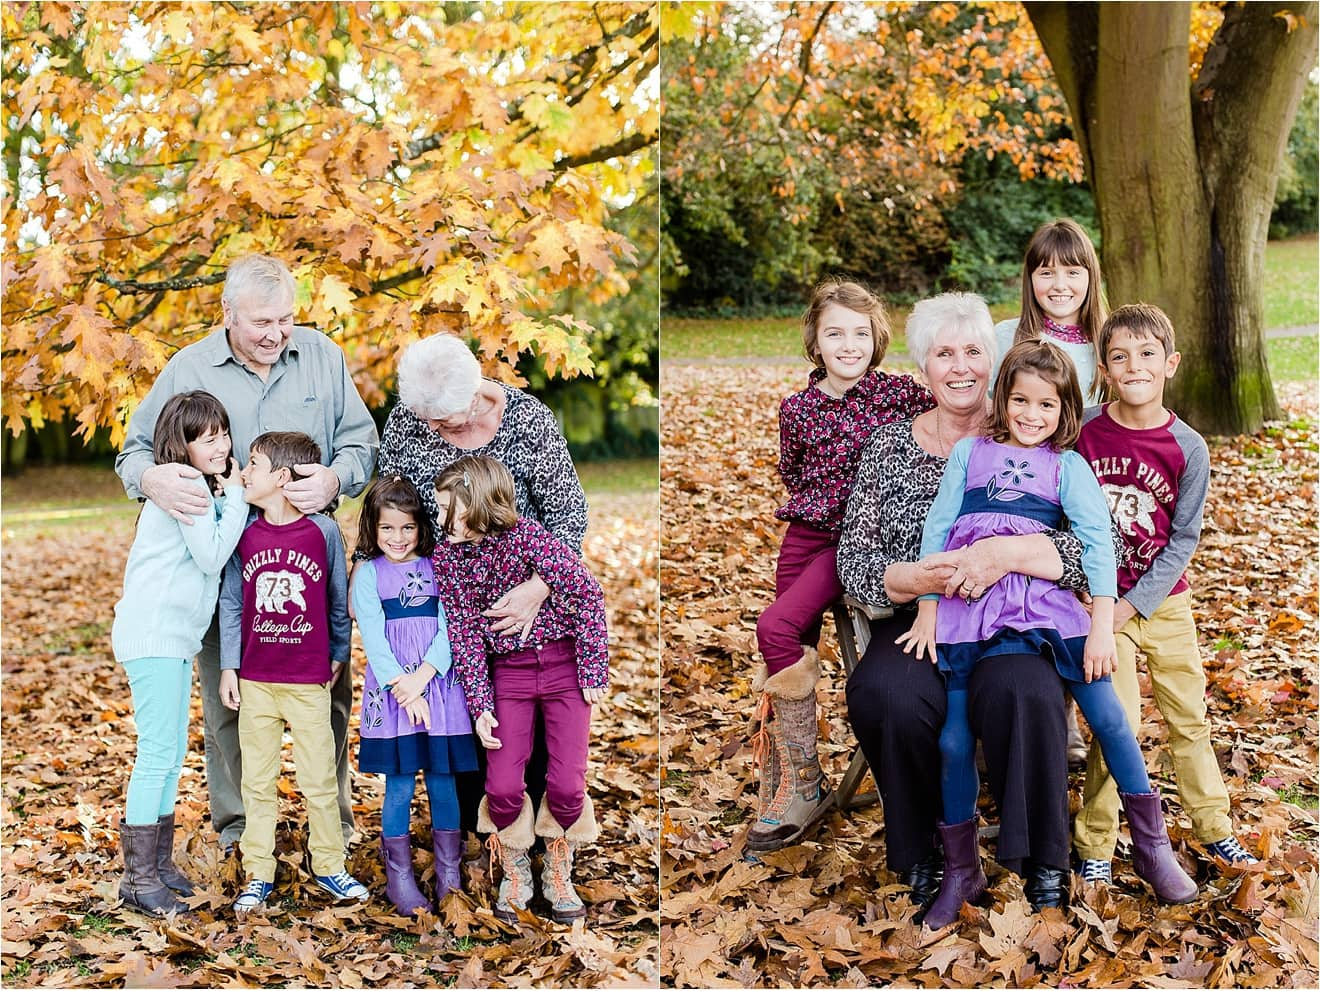 002_family-photography-surrey-autumn-mini-session-eddie-judd-photographer_9553